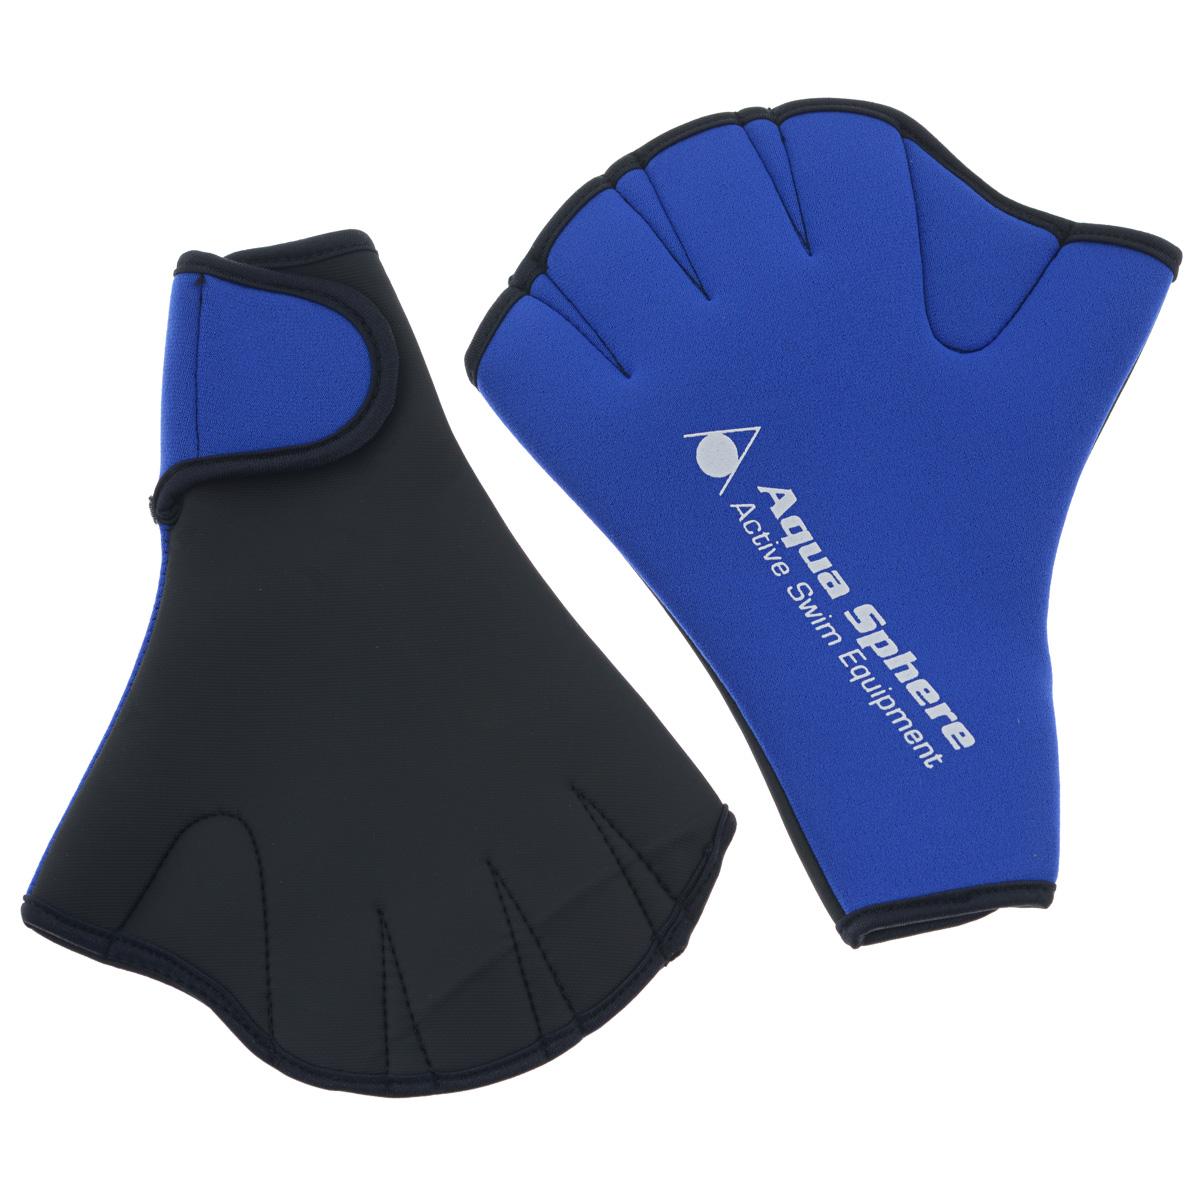 Перчатки для рук Aqua Sphere Swim Glove, цвет: синий. Размер S ковролин ideal echo 331 3м